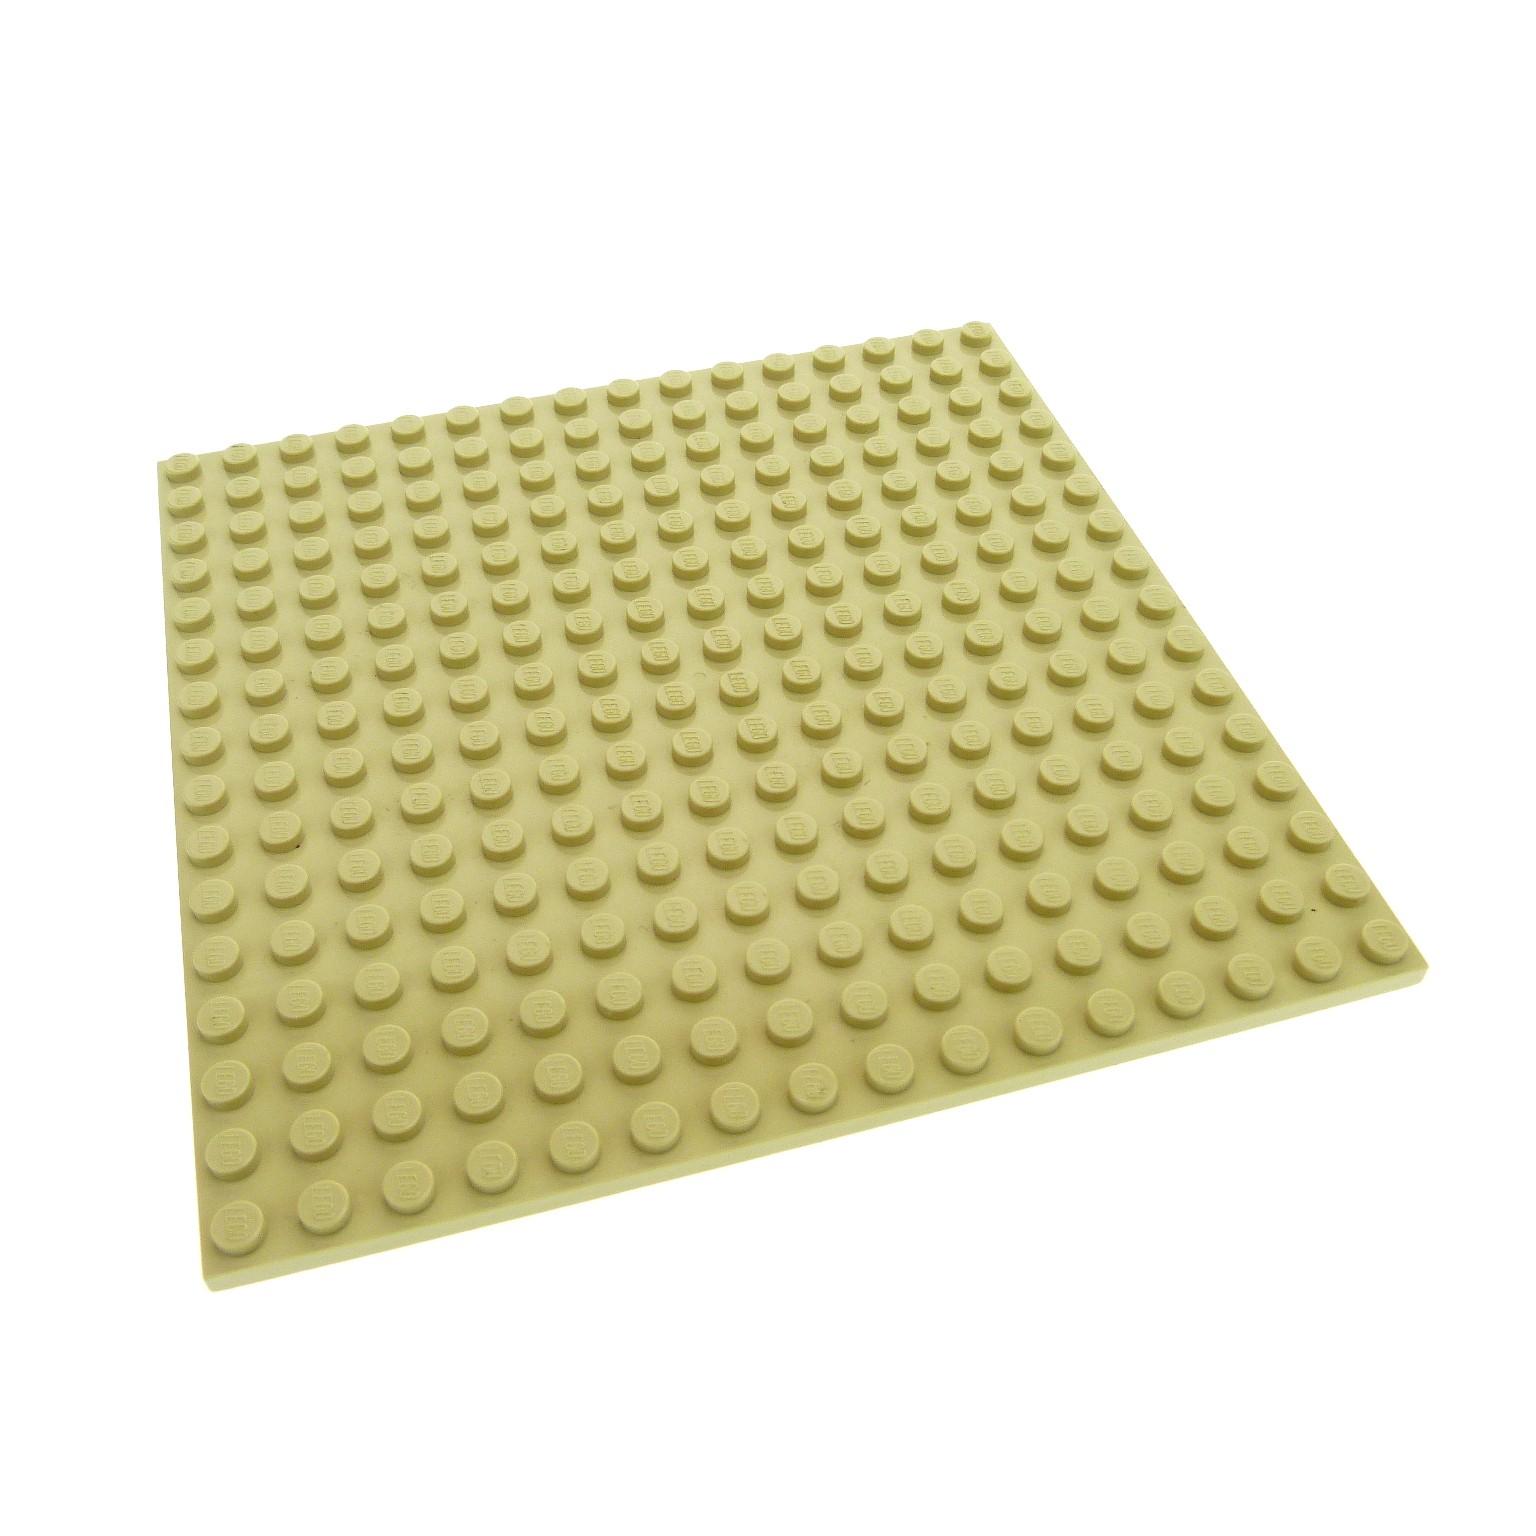 Lego Platte Beige 16x32 Baukästen & Konstruktion